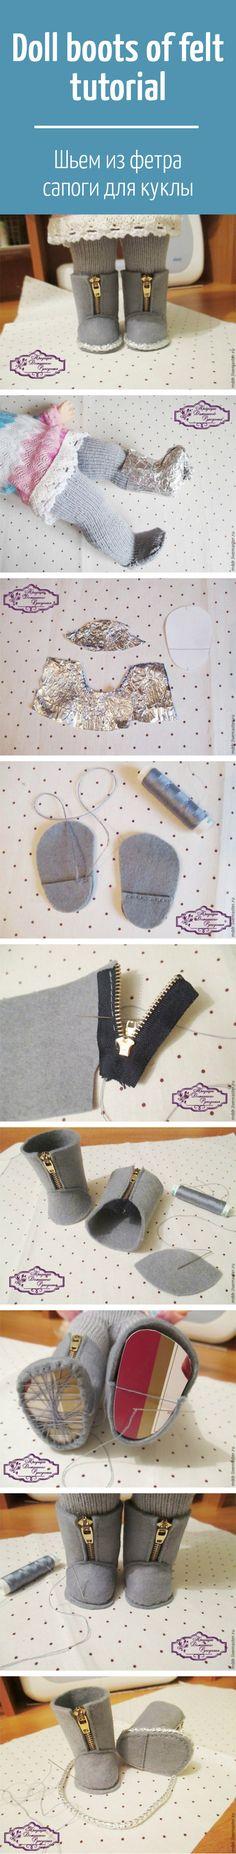 Cute doll boots of felt tutorial / Шьем из фетра сапоги для куклы